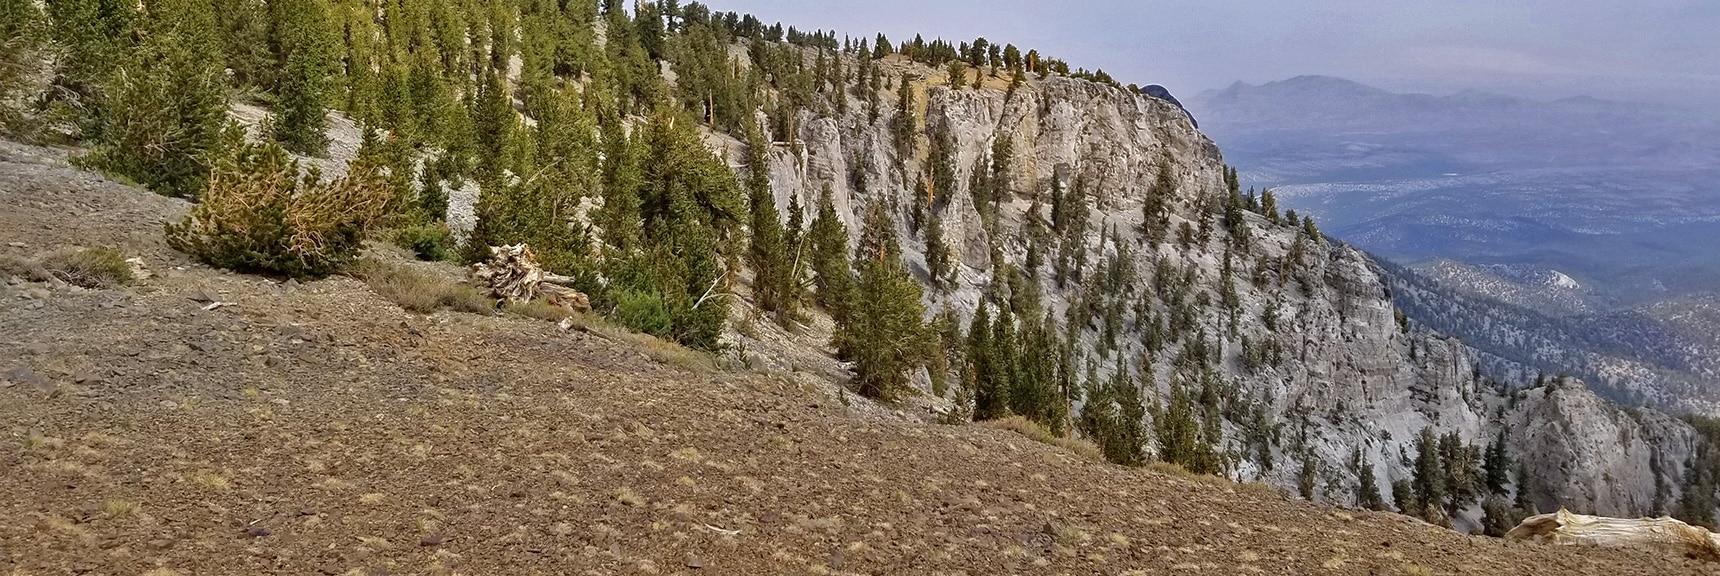 Approaching the NE Cliff and Descent Chute | Mummy Mountain NE Cliffs Descent | Mt Charleston Wilderness | Spring Mountains, Nevada